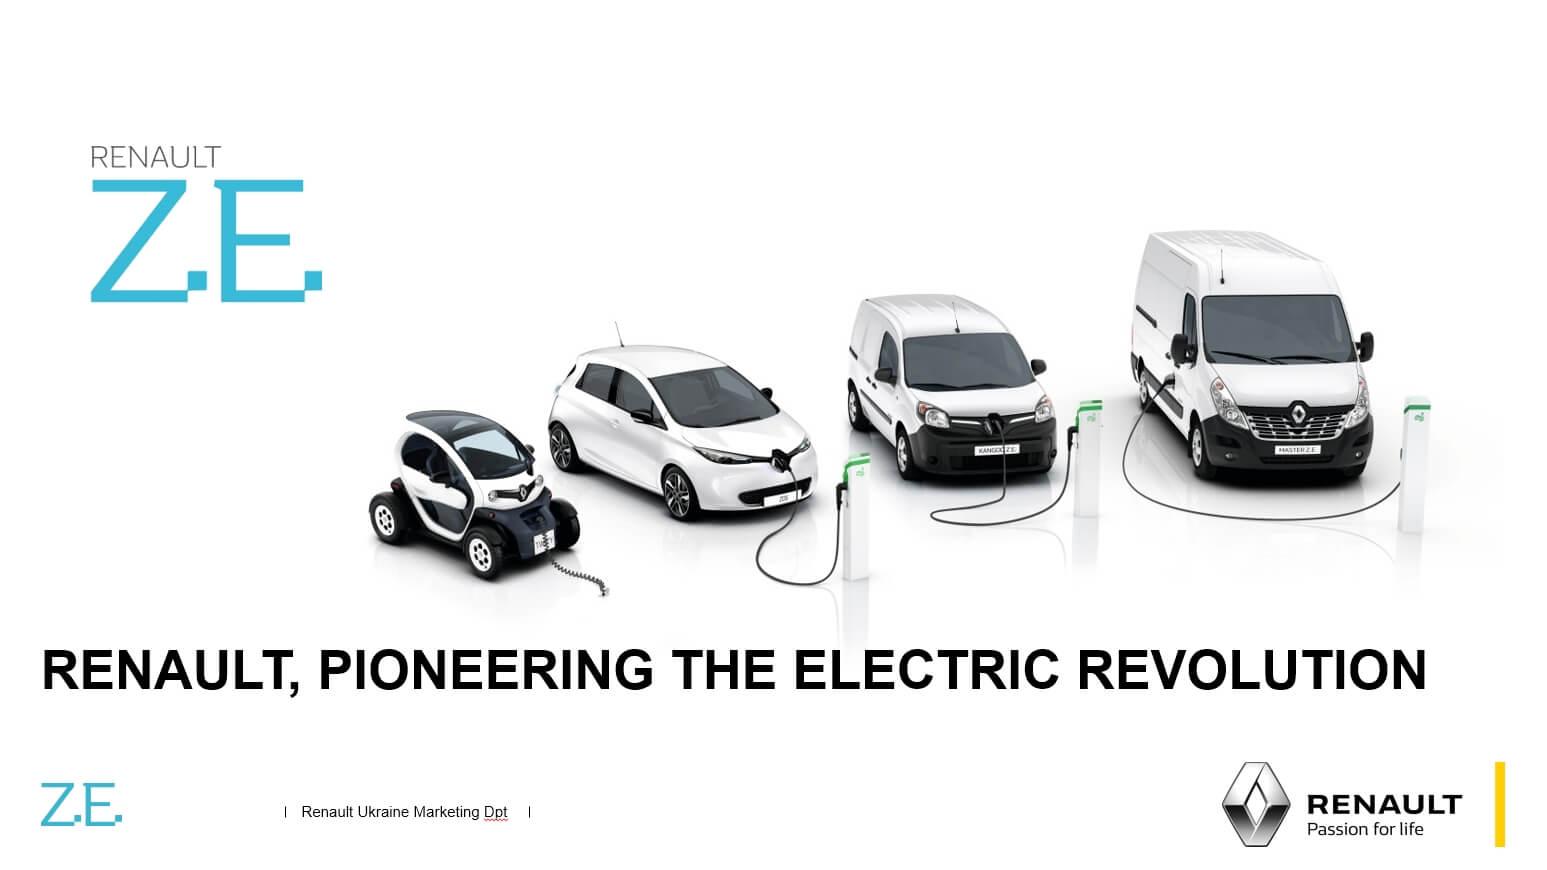 Александр Мытник: Renault Украина вразвитии электромобильности